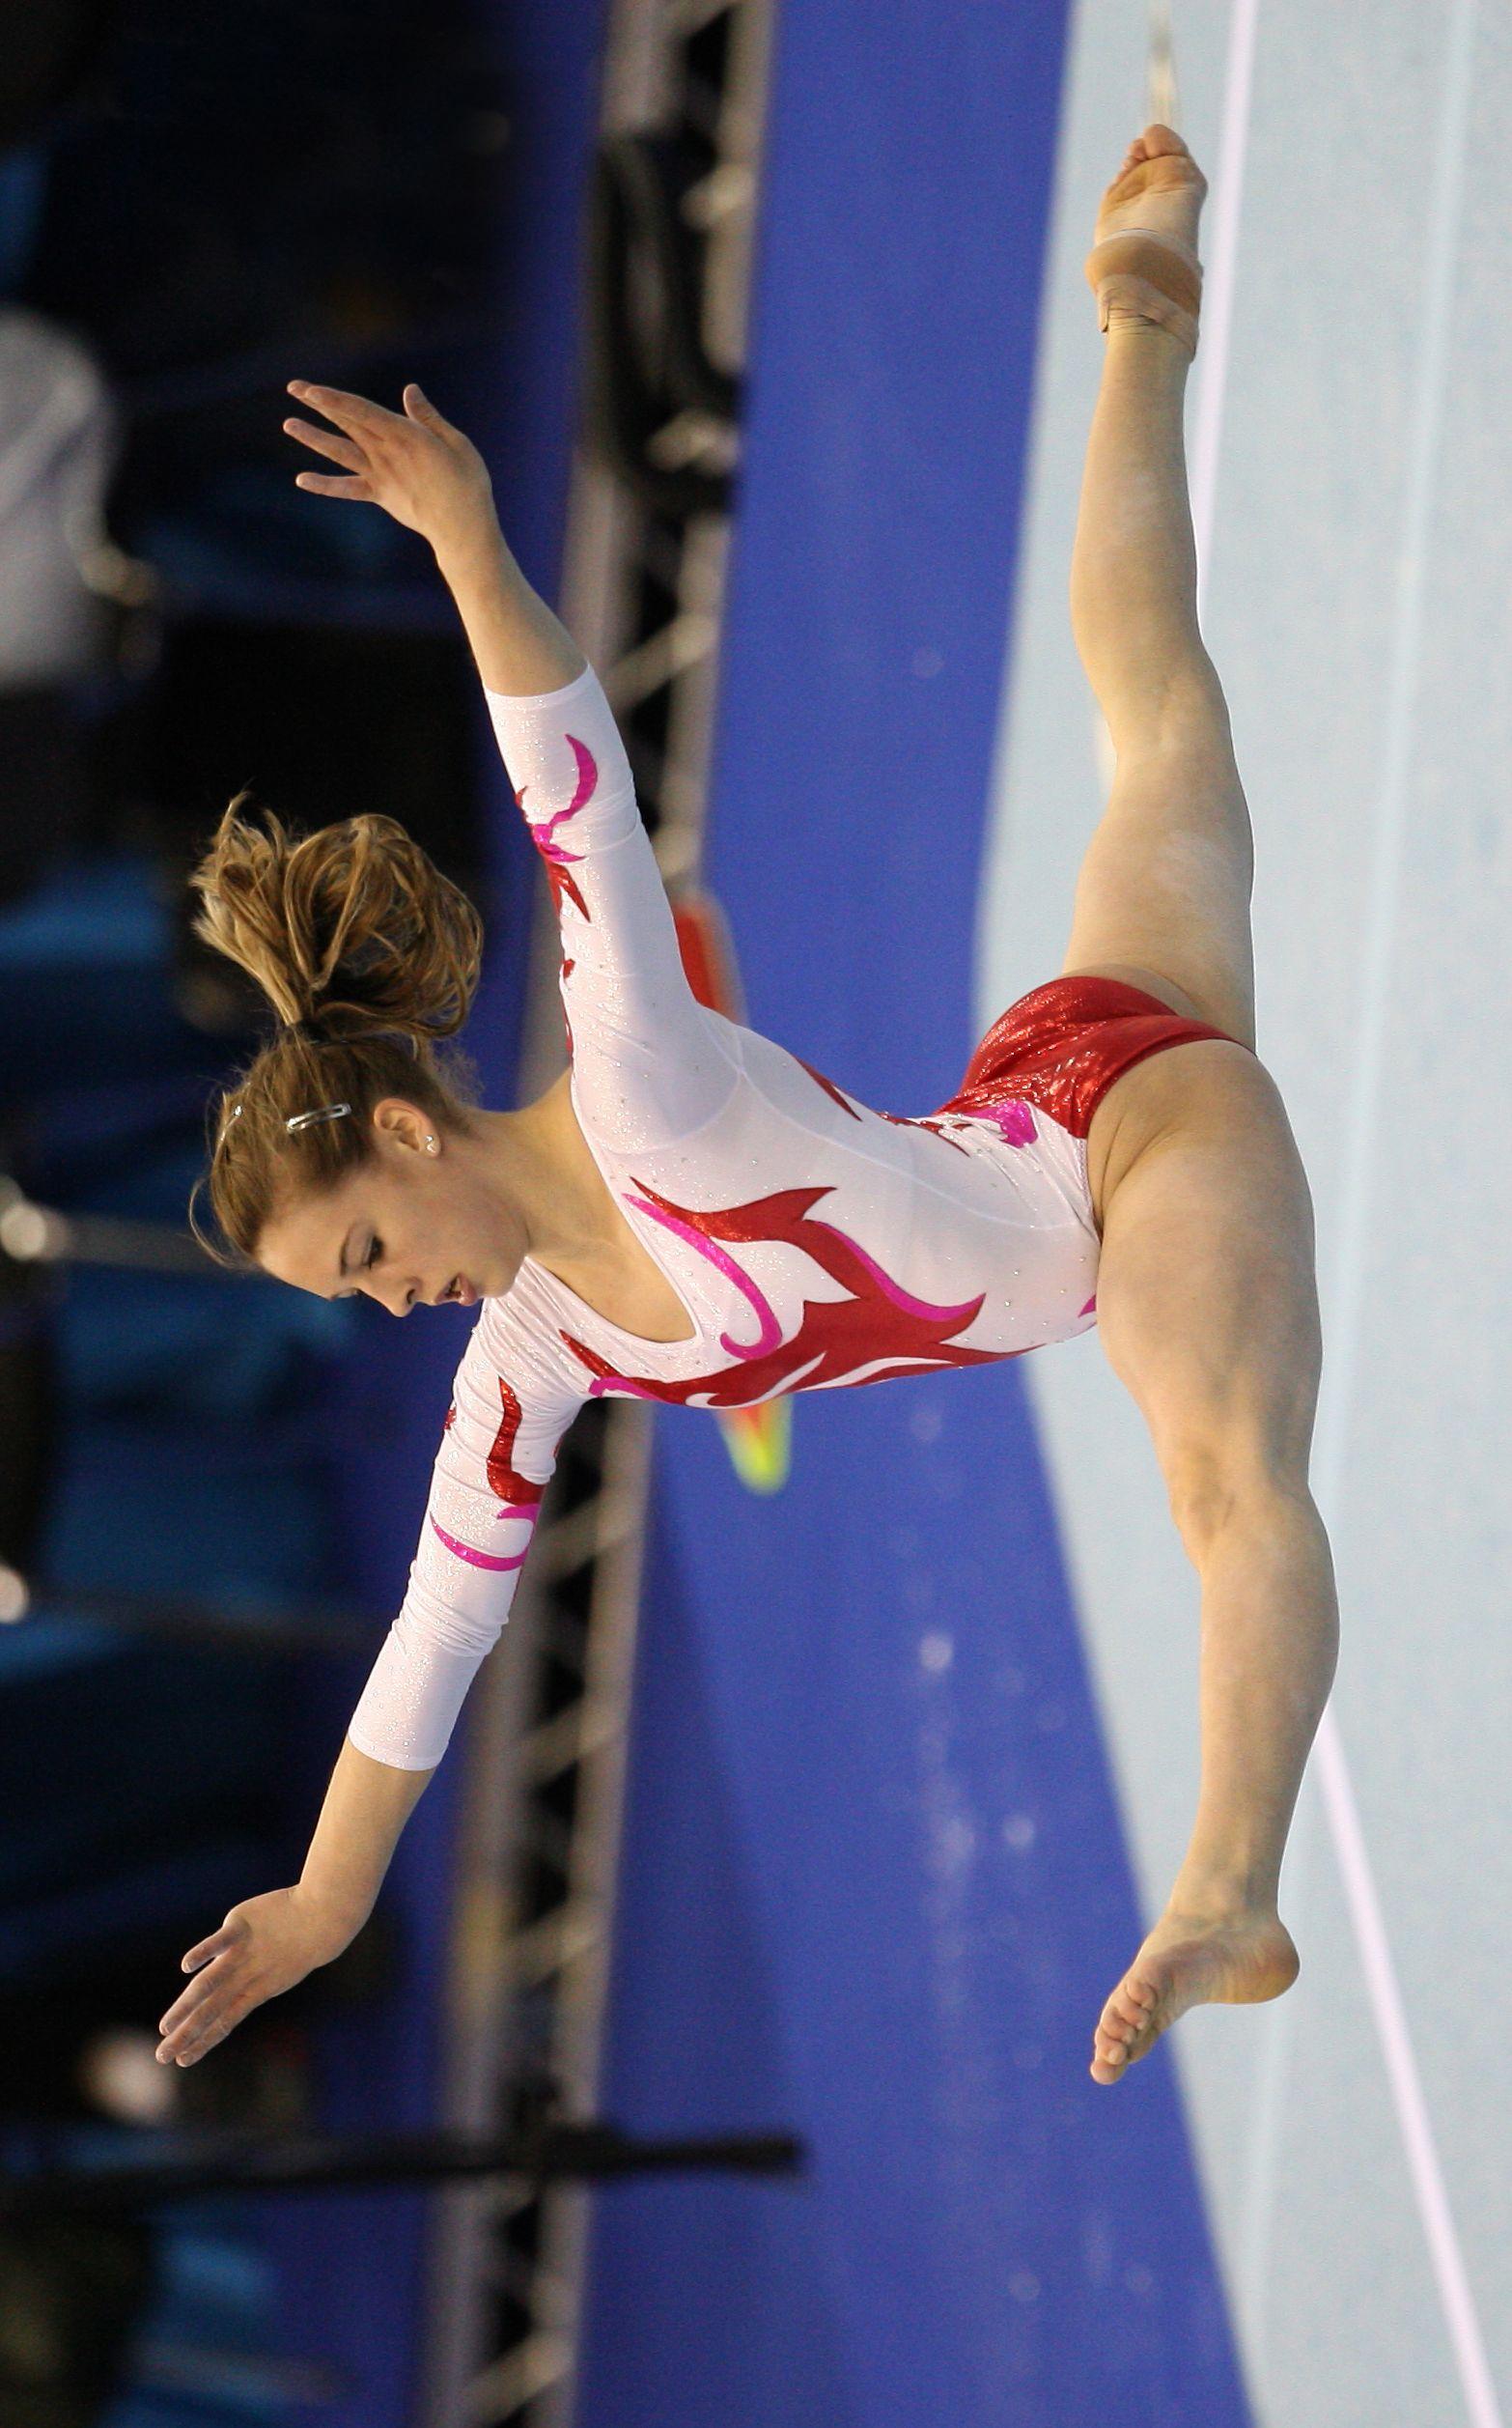 PICS  Sexy Rhythmic Gymnasts   Indiatimes com Ranker